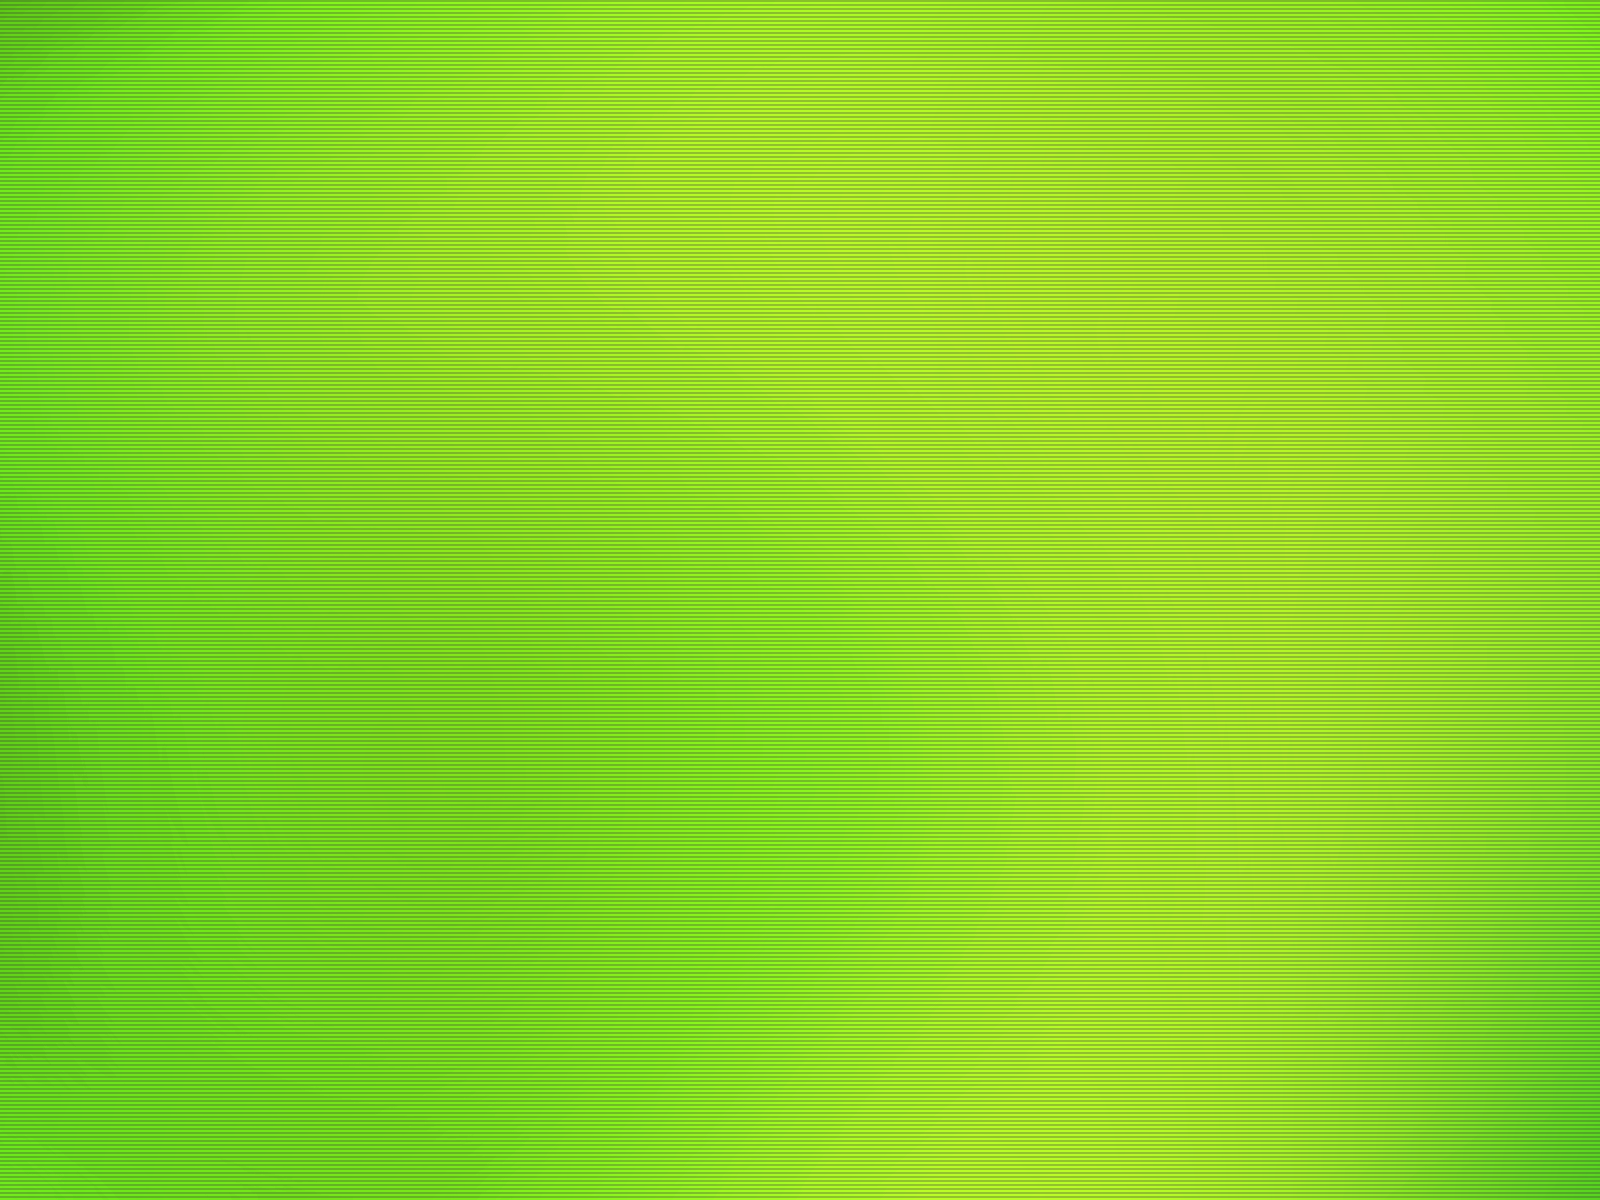 Light Green Background - WallpaperSafari